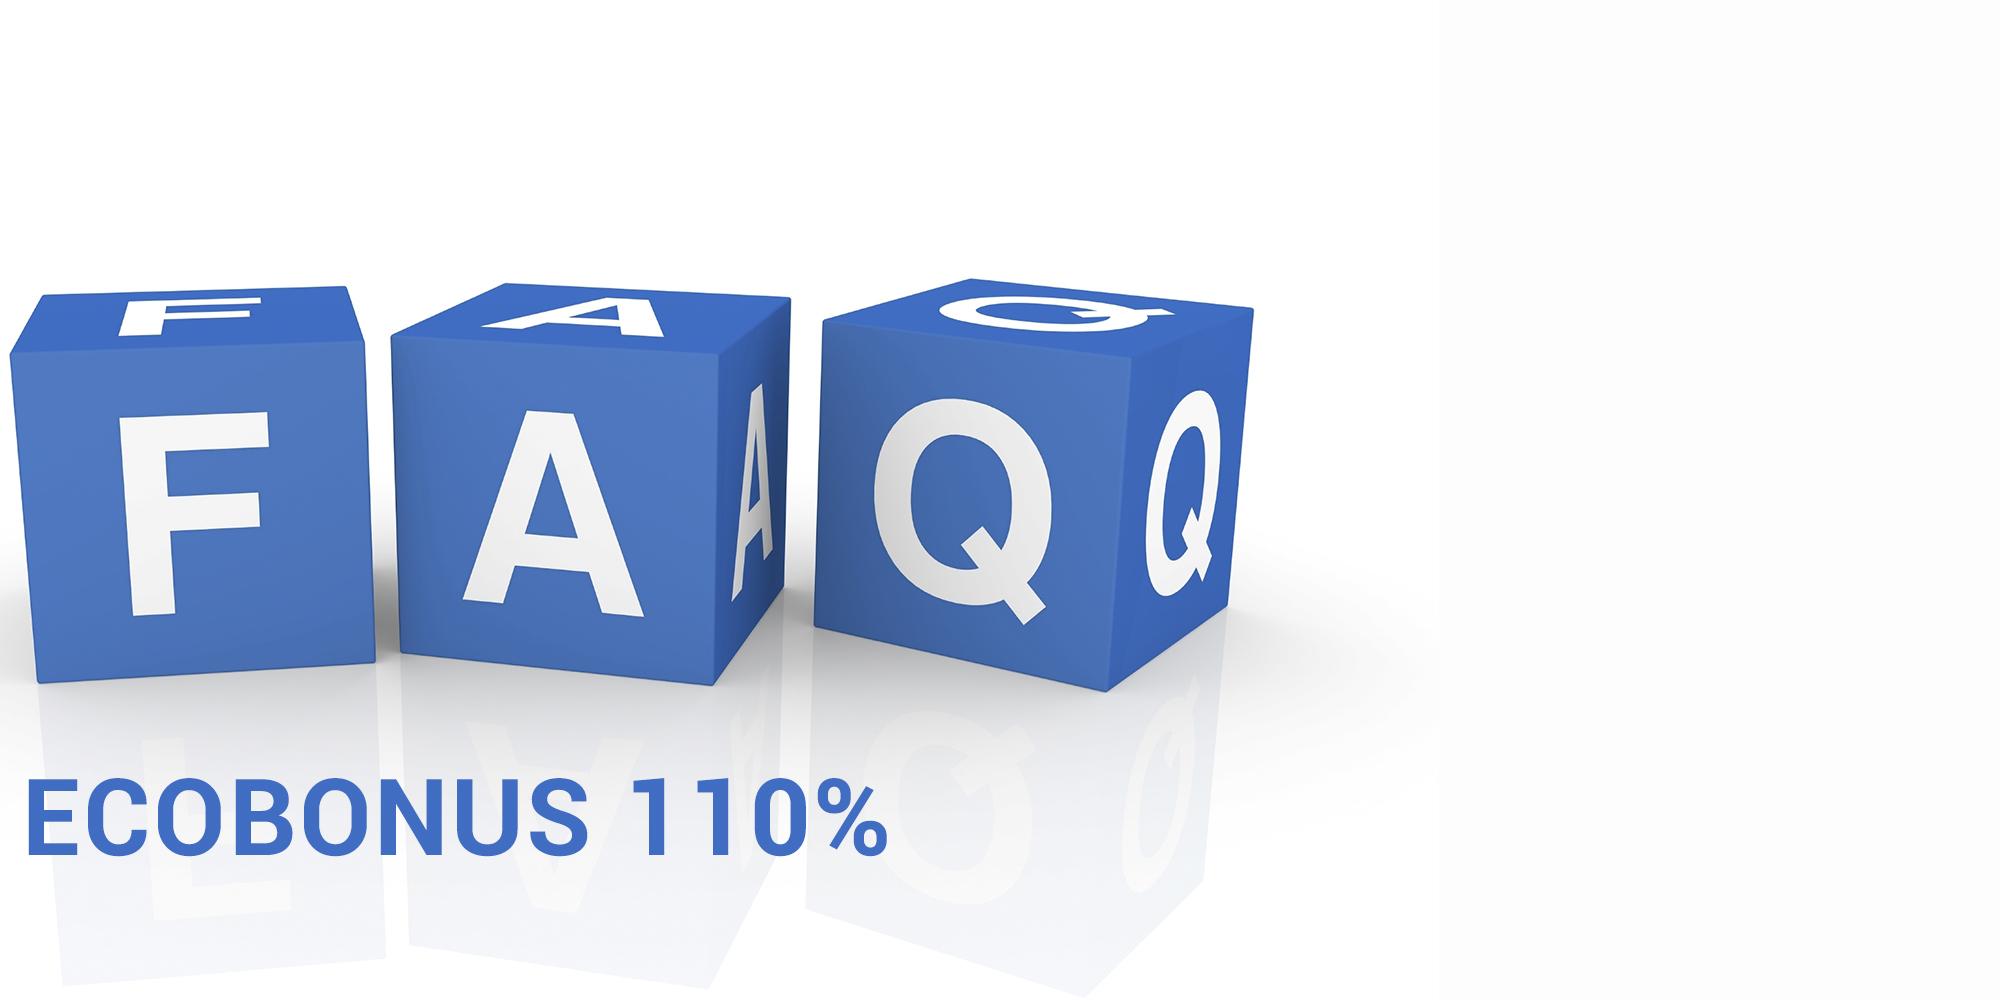 ECOBONUS 110%: Domande e Risposte